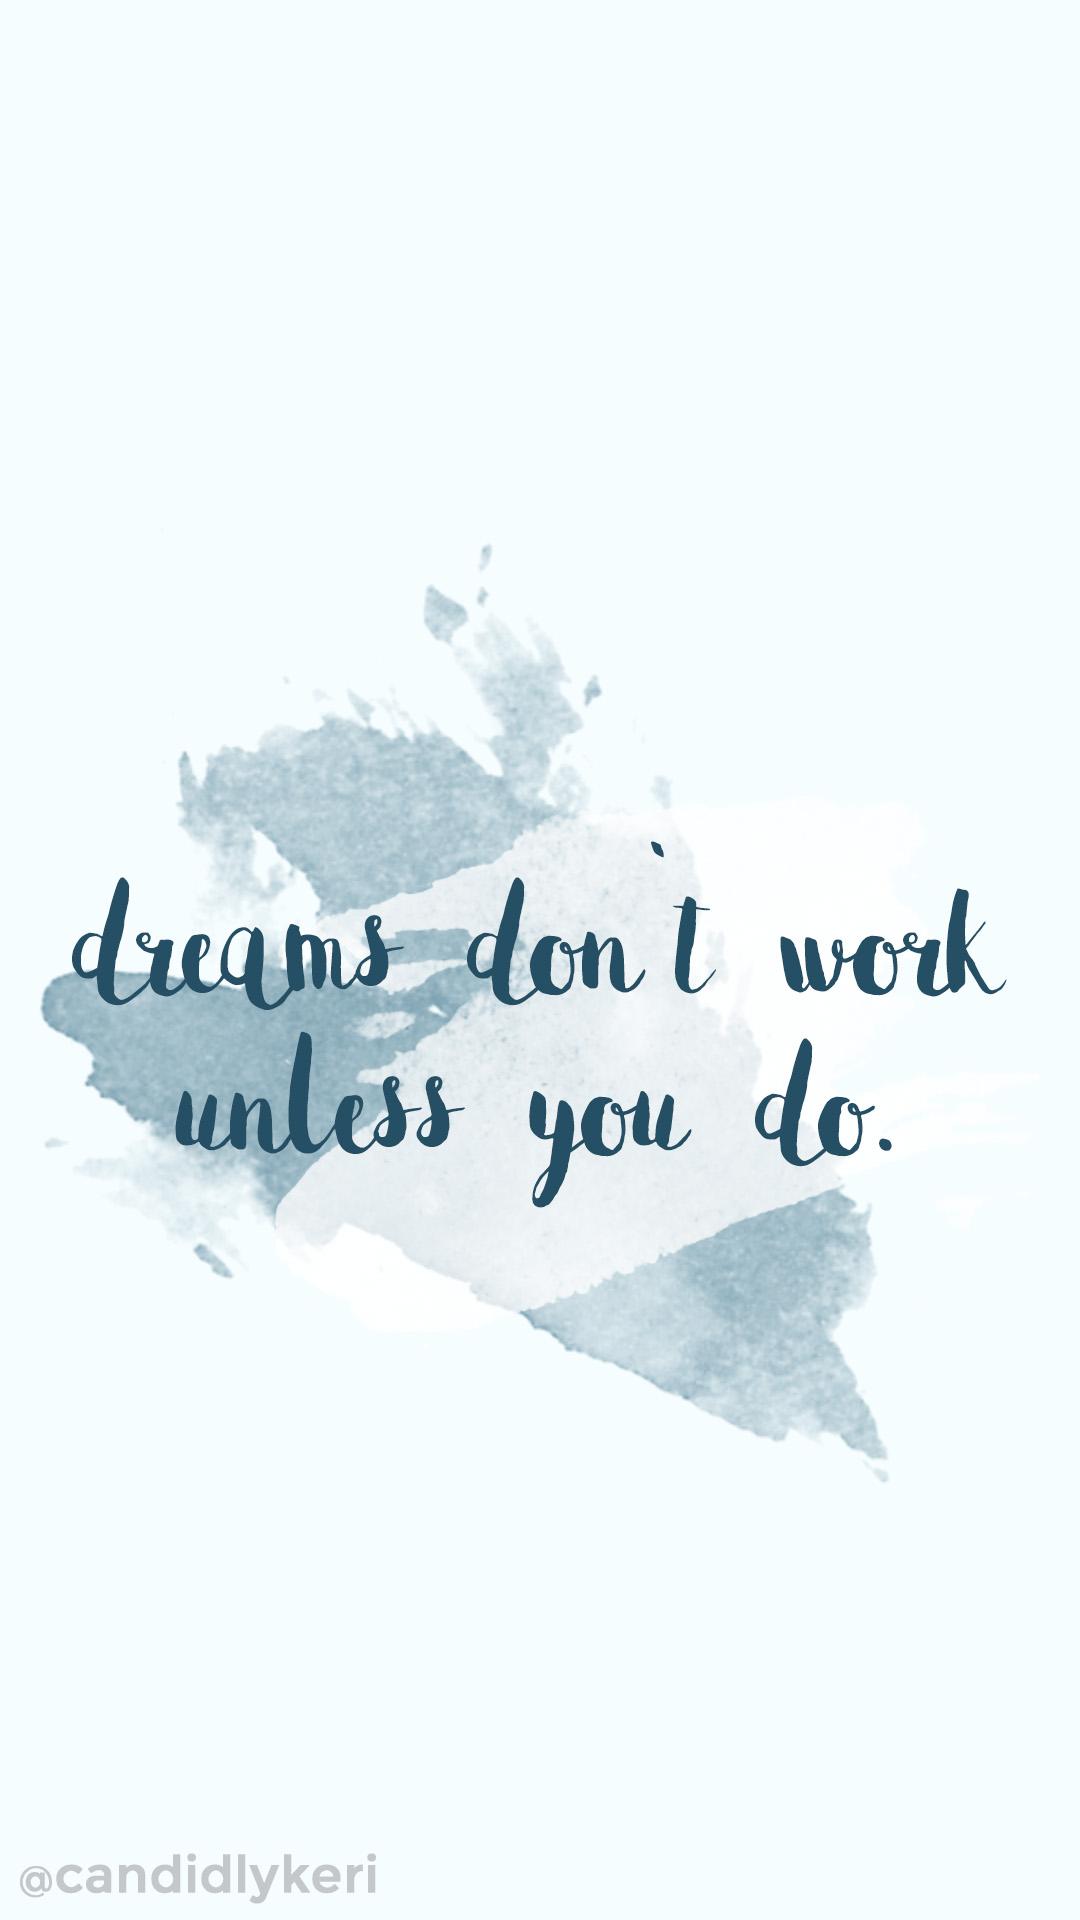 ddcfeedccff-inspiring-backgrounds-motivational-backgrounds-iphone-wallpaper-wp3601230